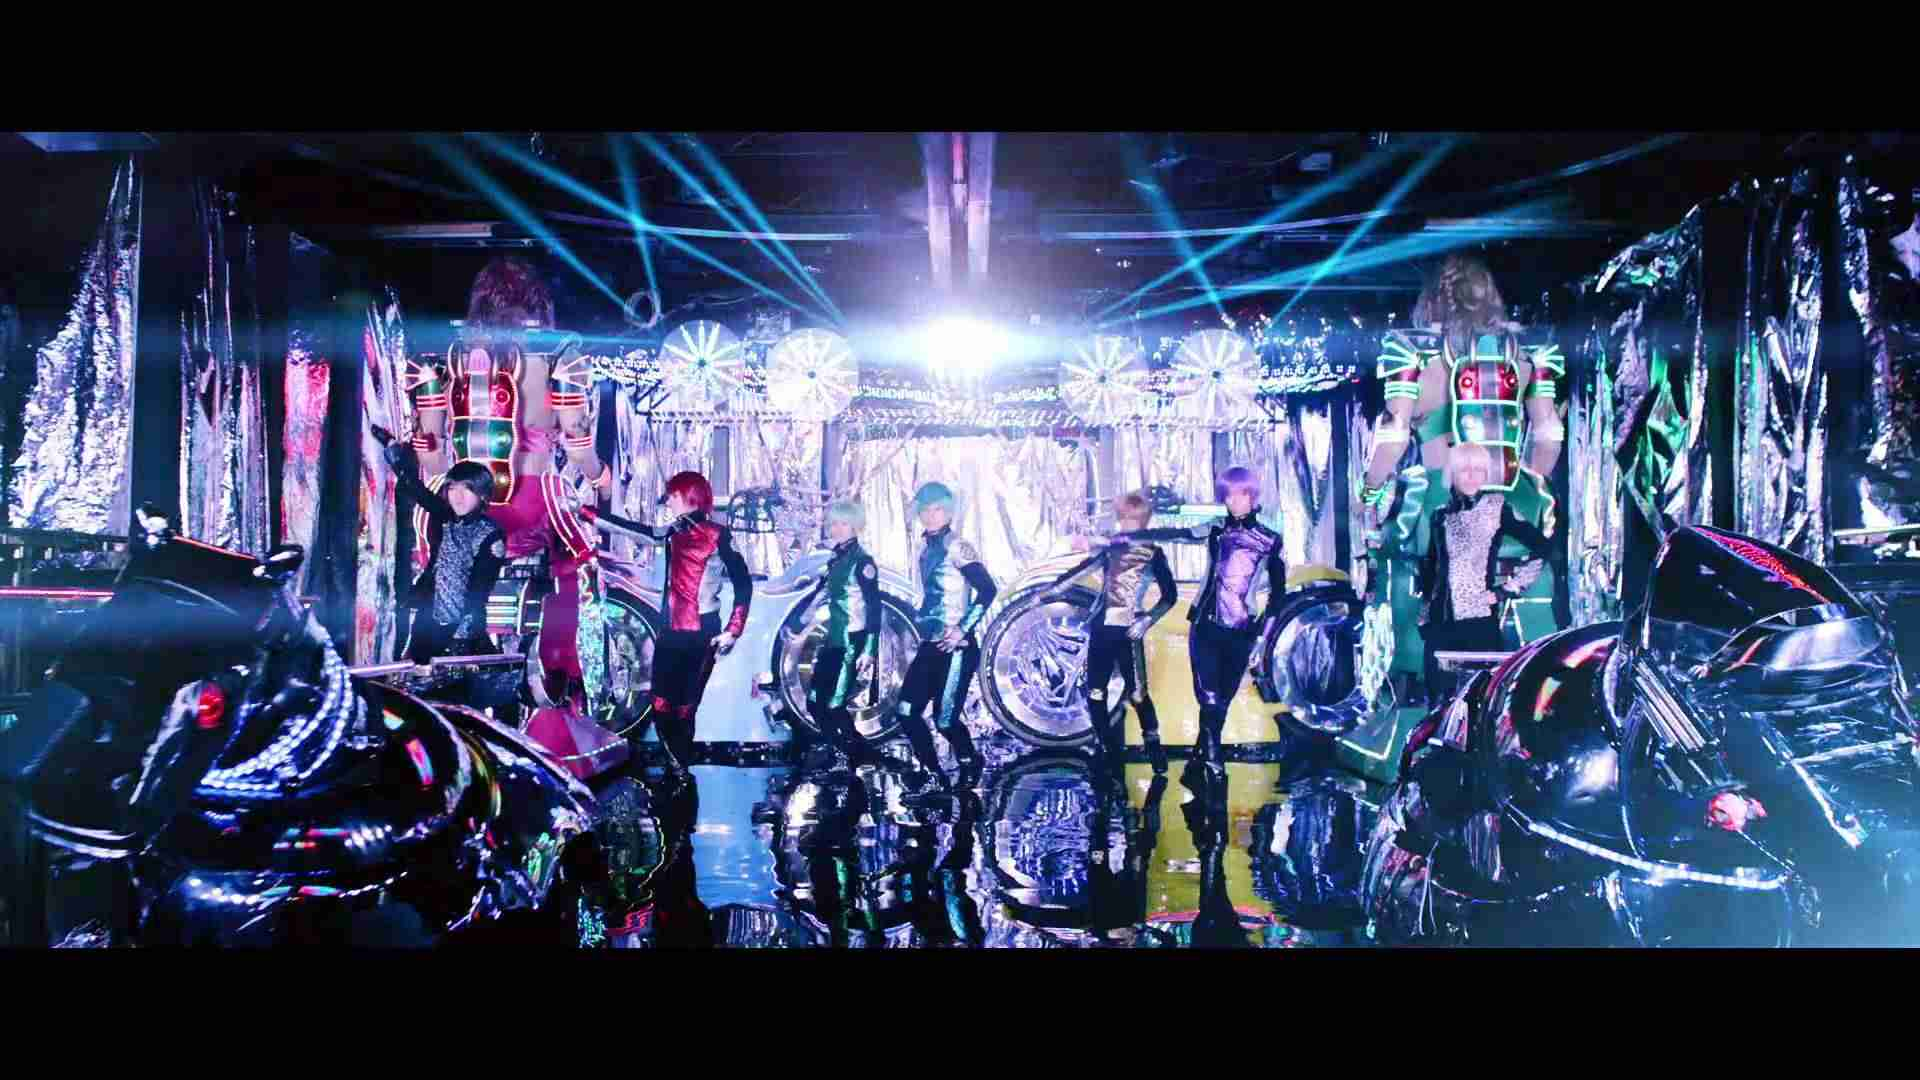 超特急「Star Gear」MUSIC VIDEO - YouTube